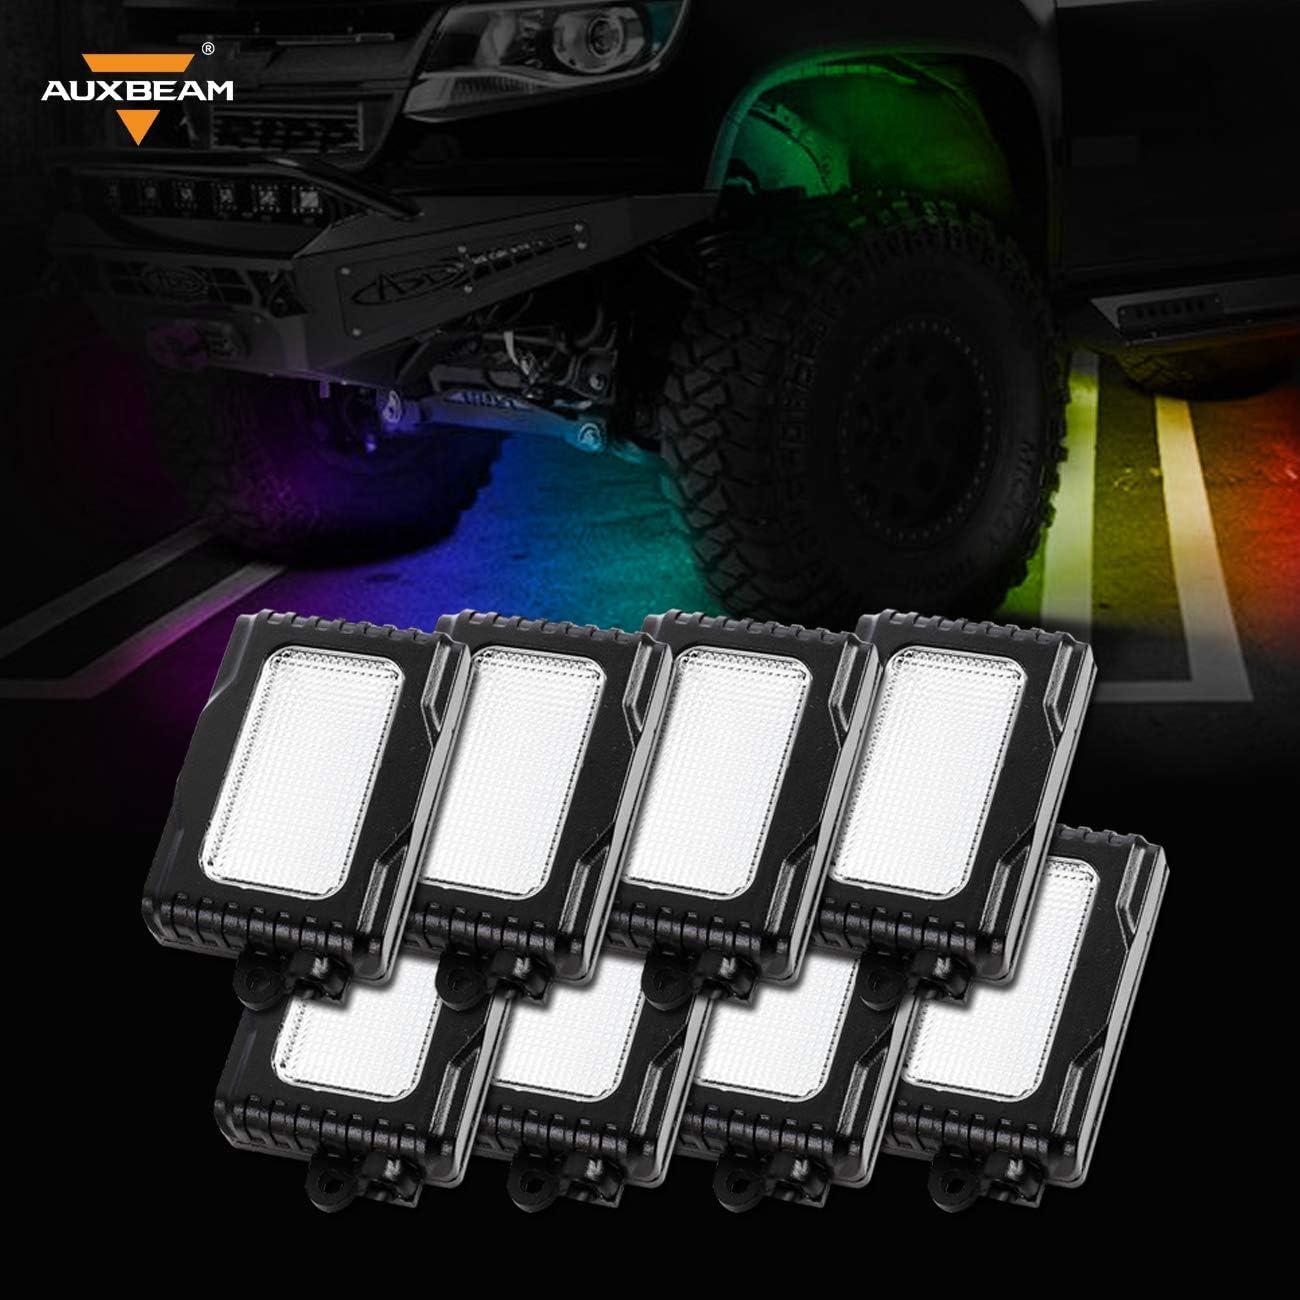 AUXBEAM CREE LED Multi-Color Rock Lights Under Body Bluetooth SUV ATV UTV Boat